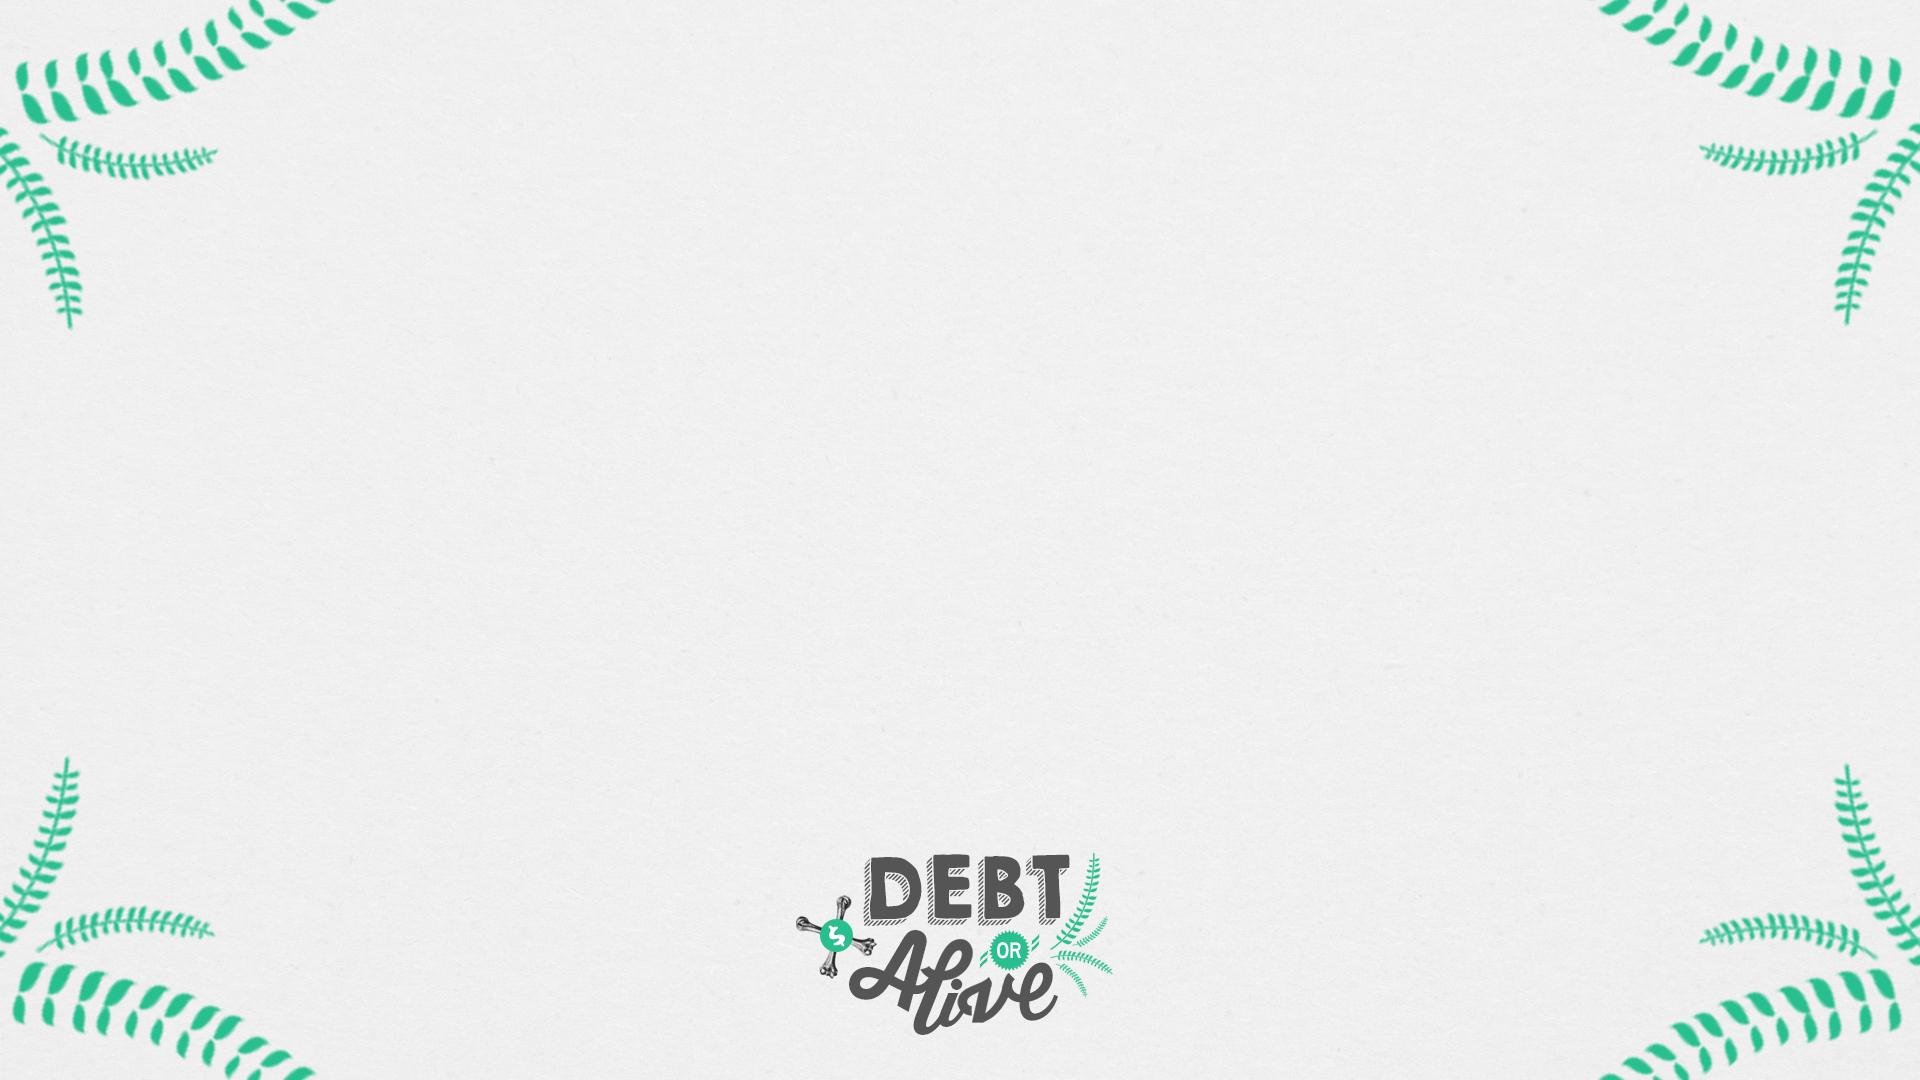 Debt or Alive Verse Slide.jpg